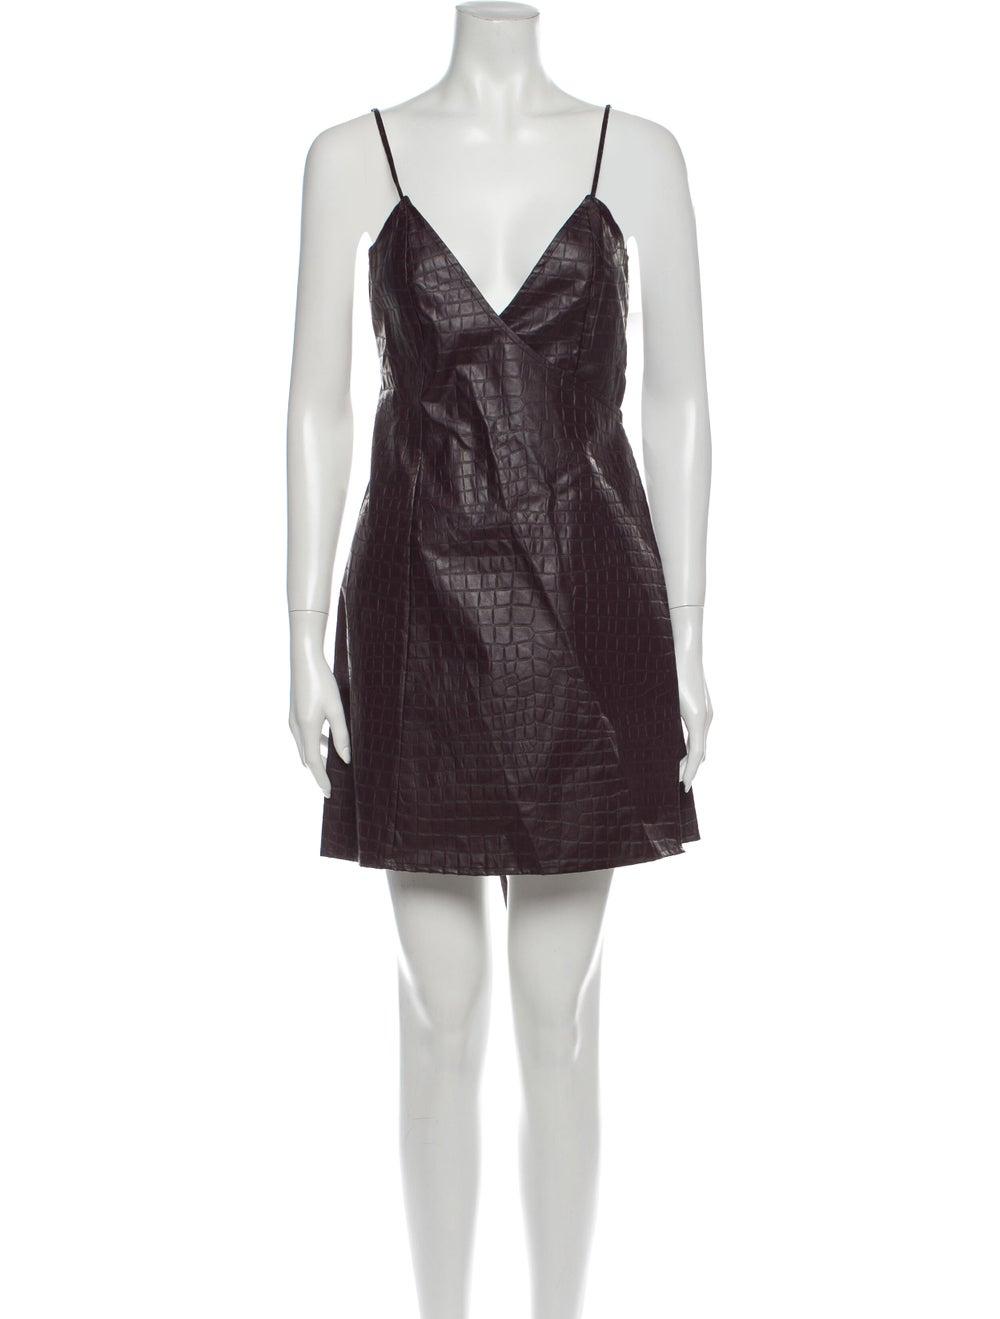 Beaufille Linen Mini Dress w/ Tags - image 1